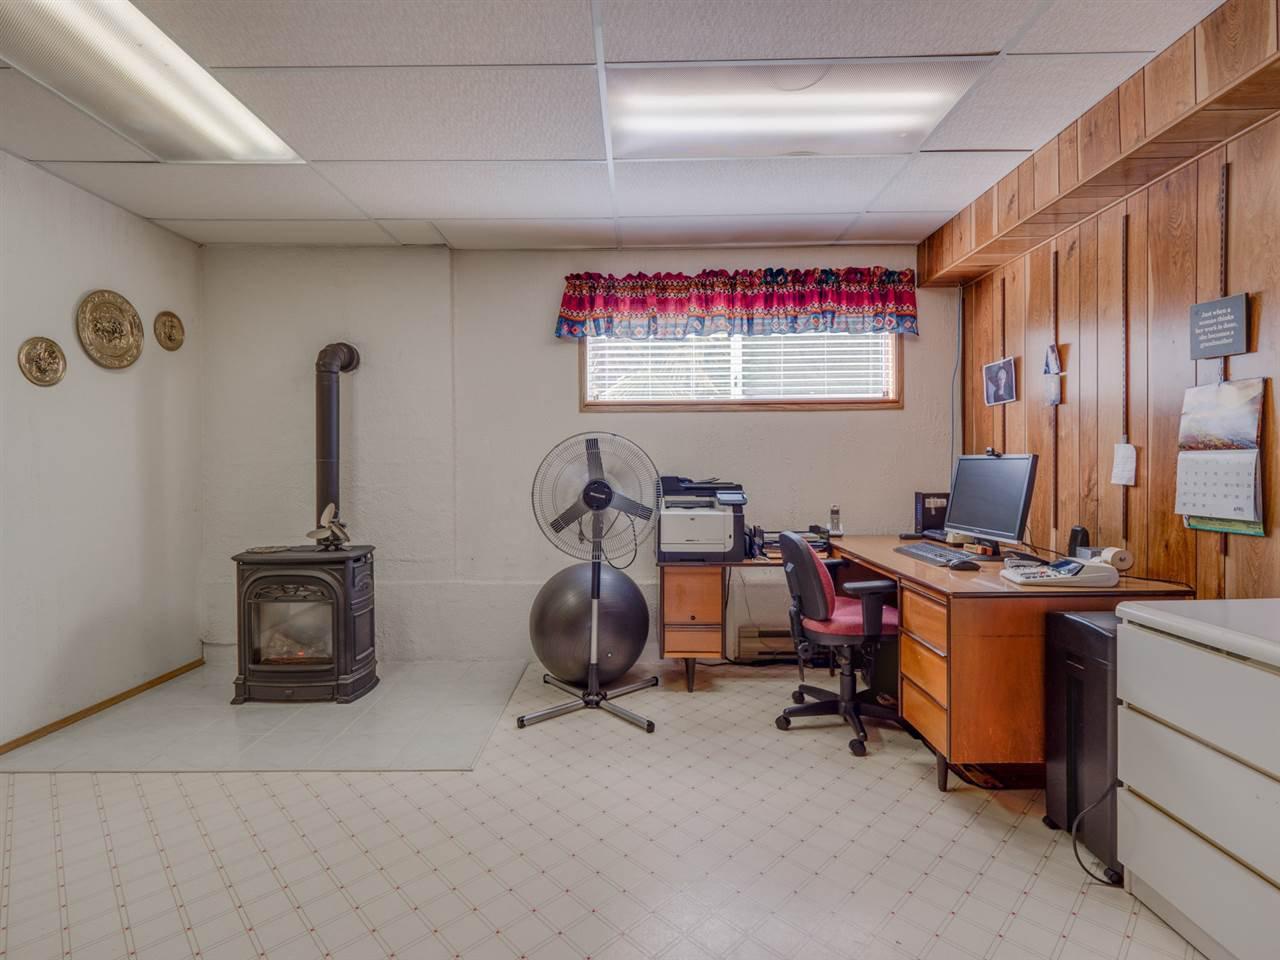 Photo 12: Photos: 4983 ARBUTUS Road in Sechelt: Sechelt District House for sale (Sunshine Coast)  : MLS®# R2427502